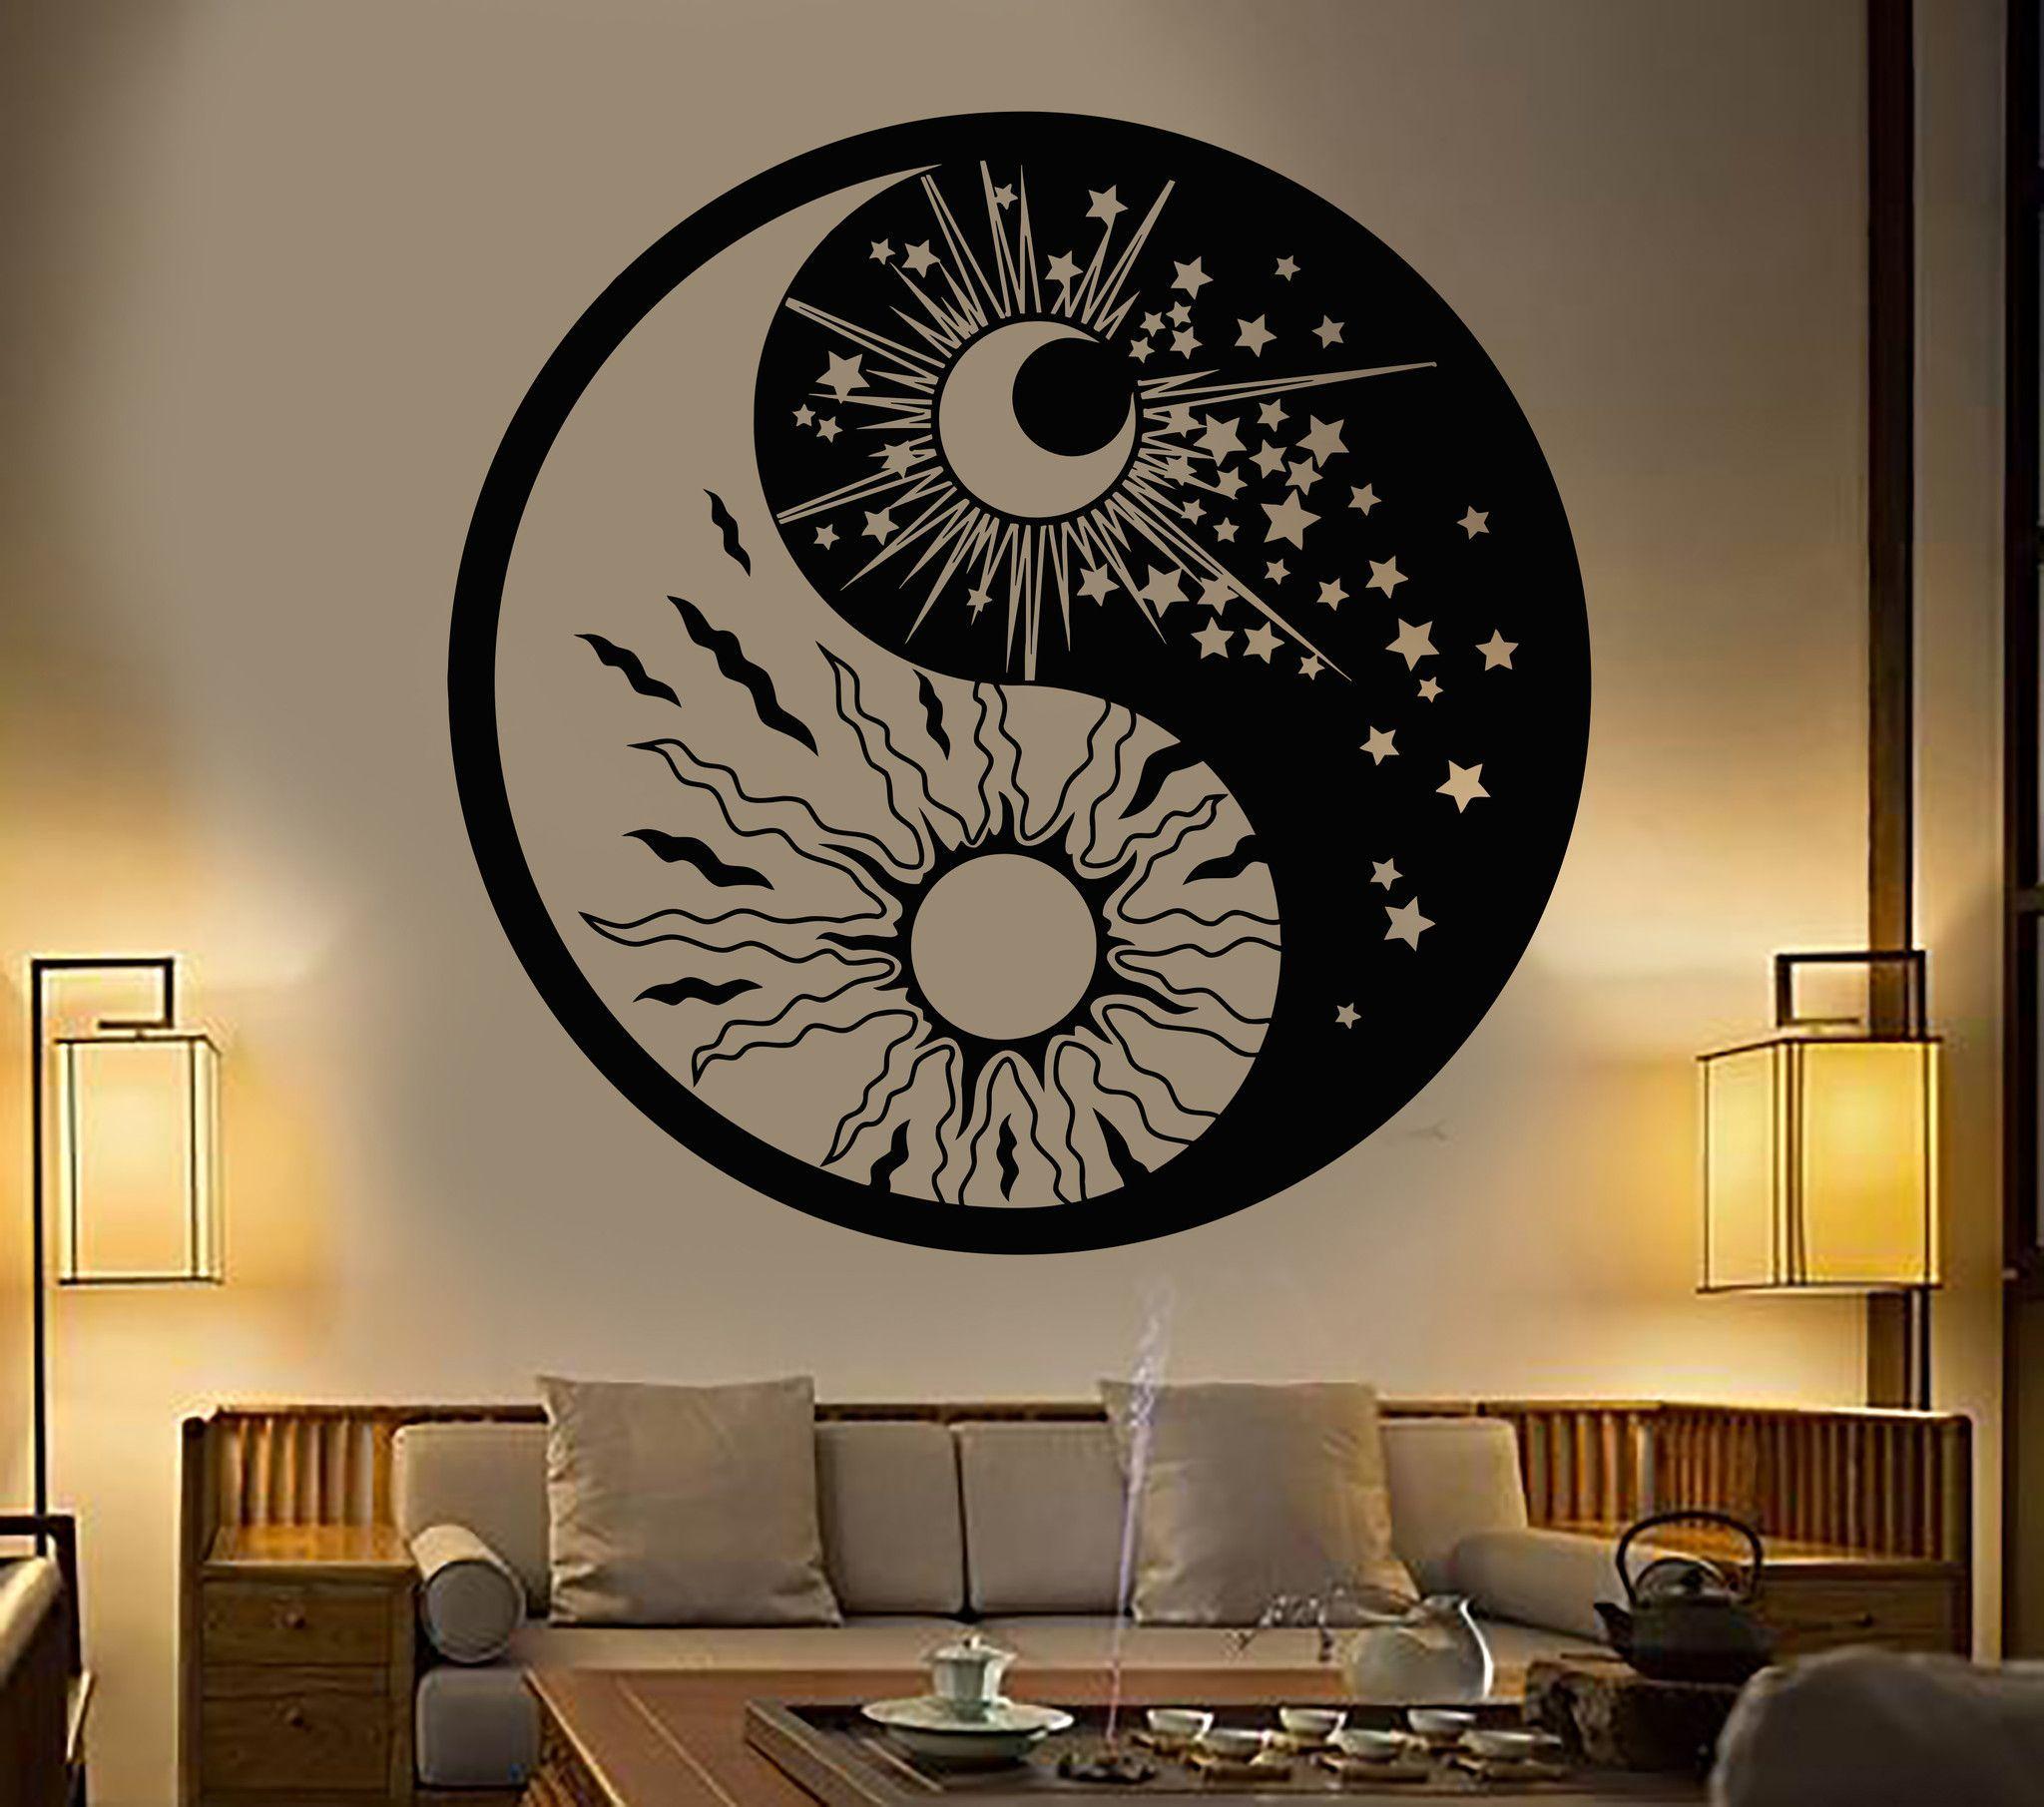 vinyl wall decal yin yang symbol sun moon buddhism stars. Black Bedroom Furniture Sets. Home Design Ideas